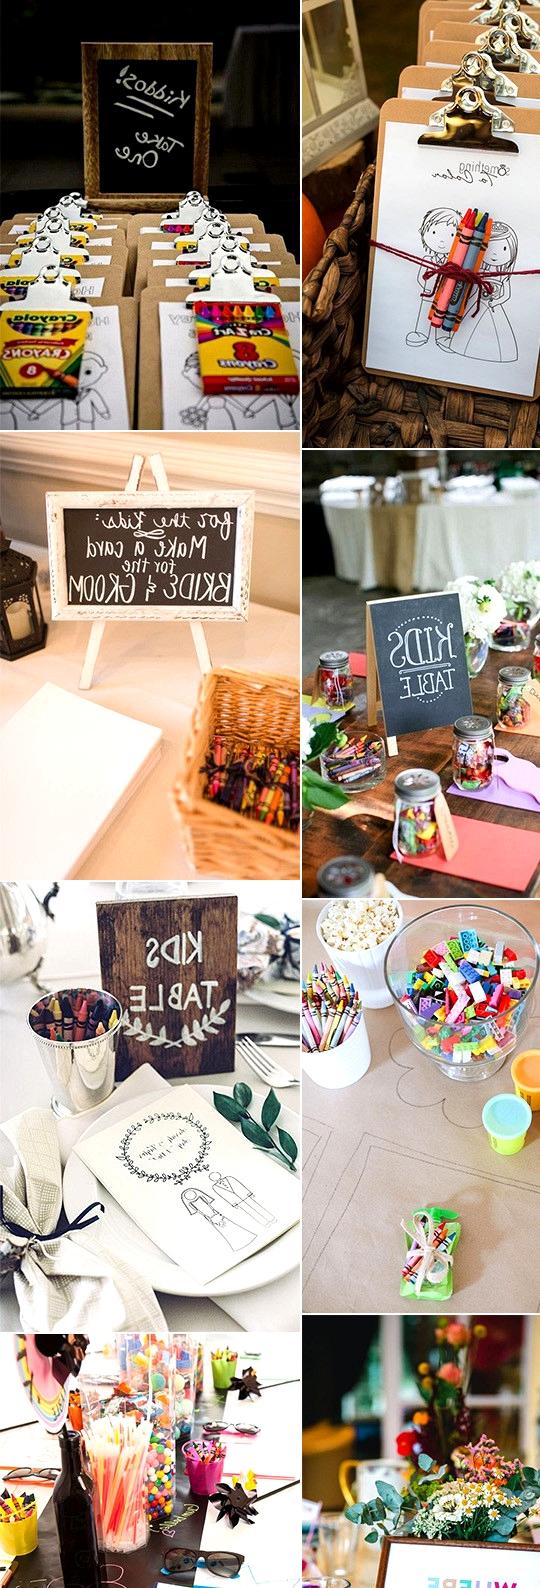 trending wedding ideas for kids at weddings